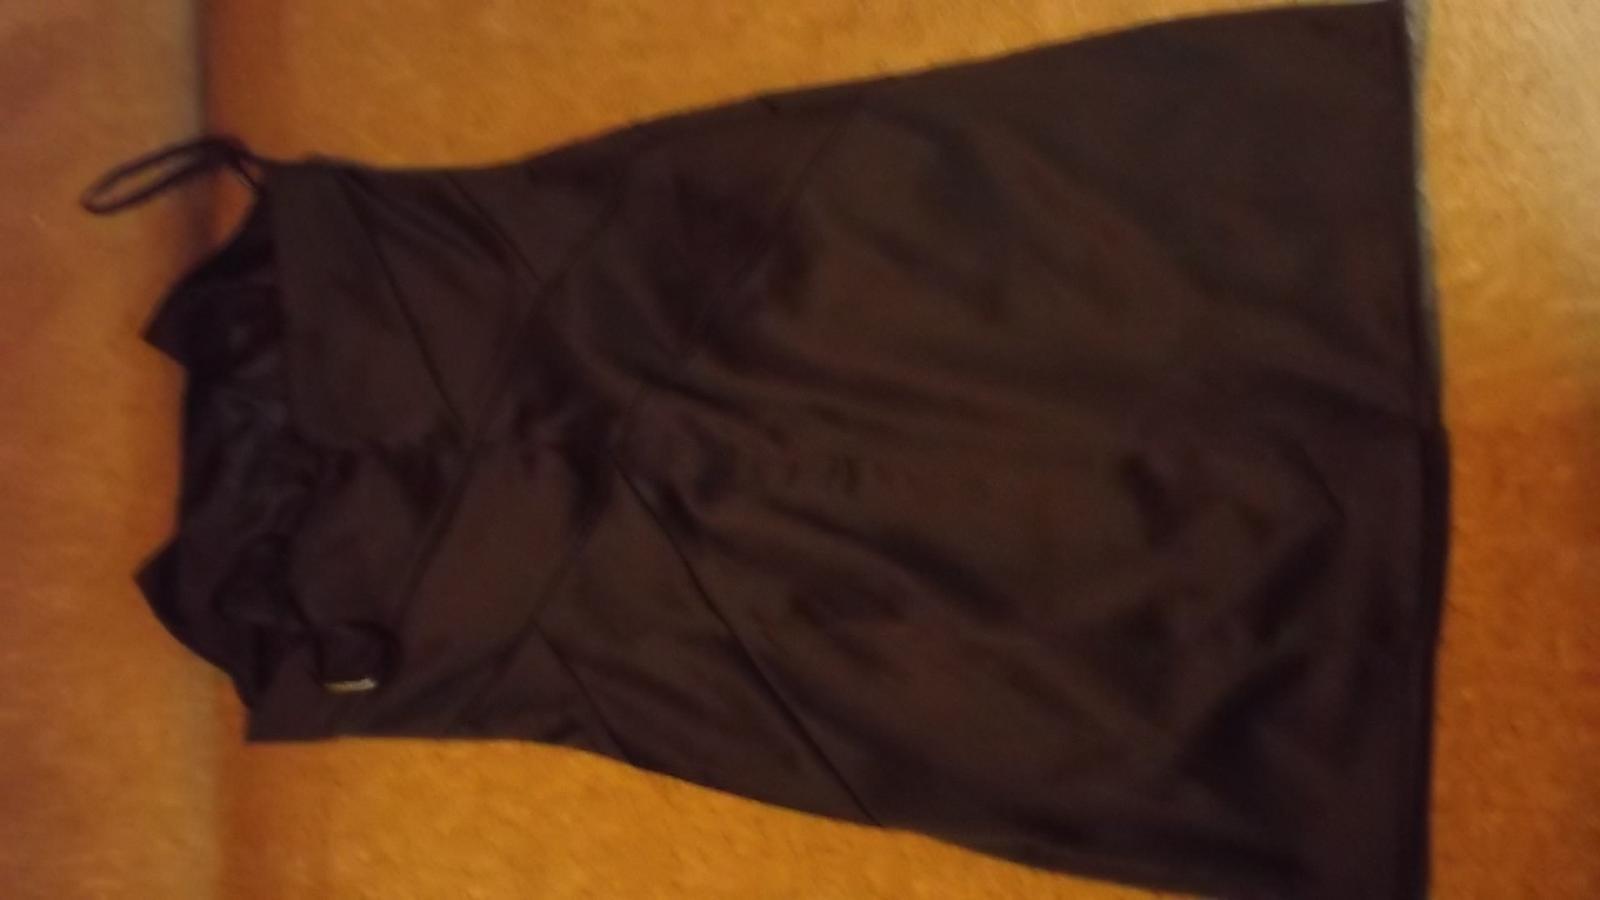 čierne koktailové šaty + topanky - Obrázok č. 1